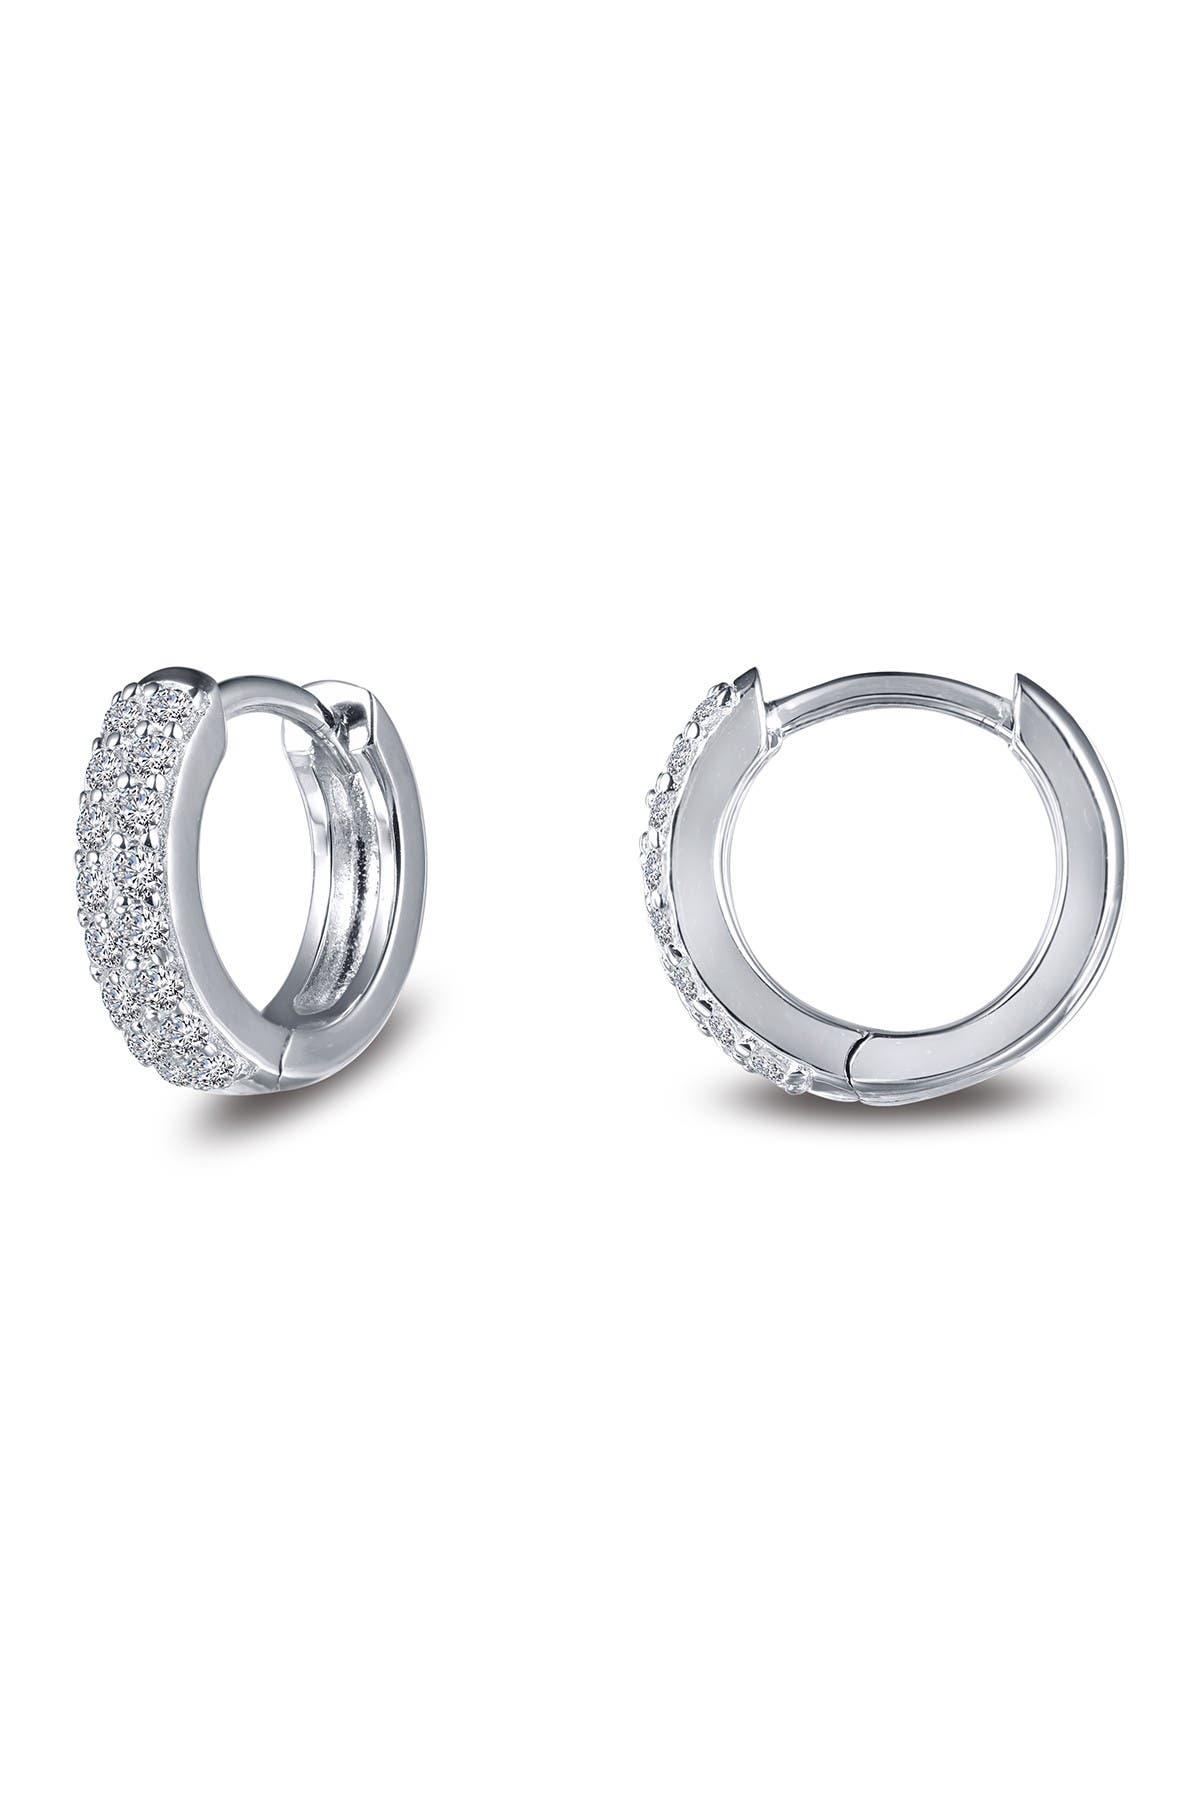 Image of LaFonn Simulated Diamond Pave 11mm Huggie Earrings